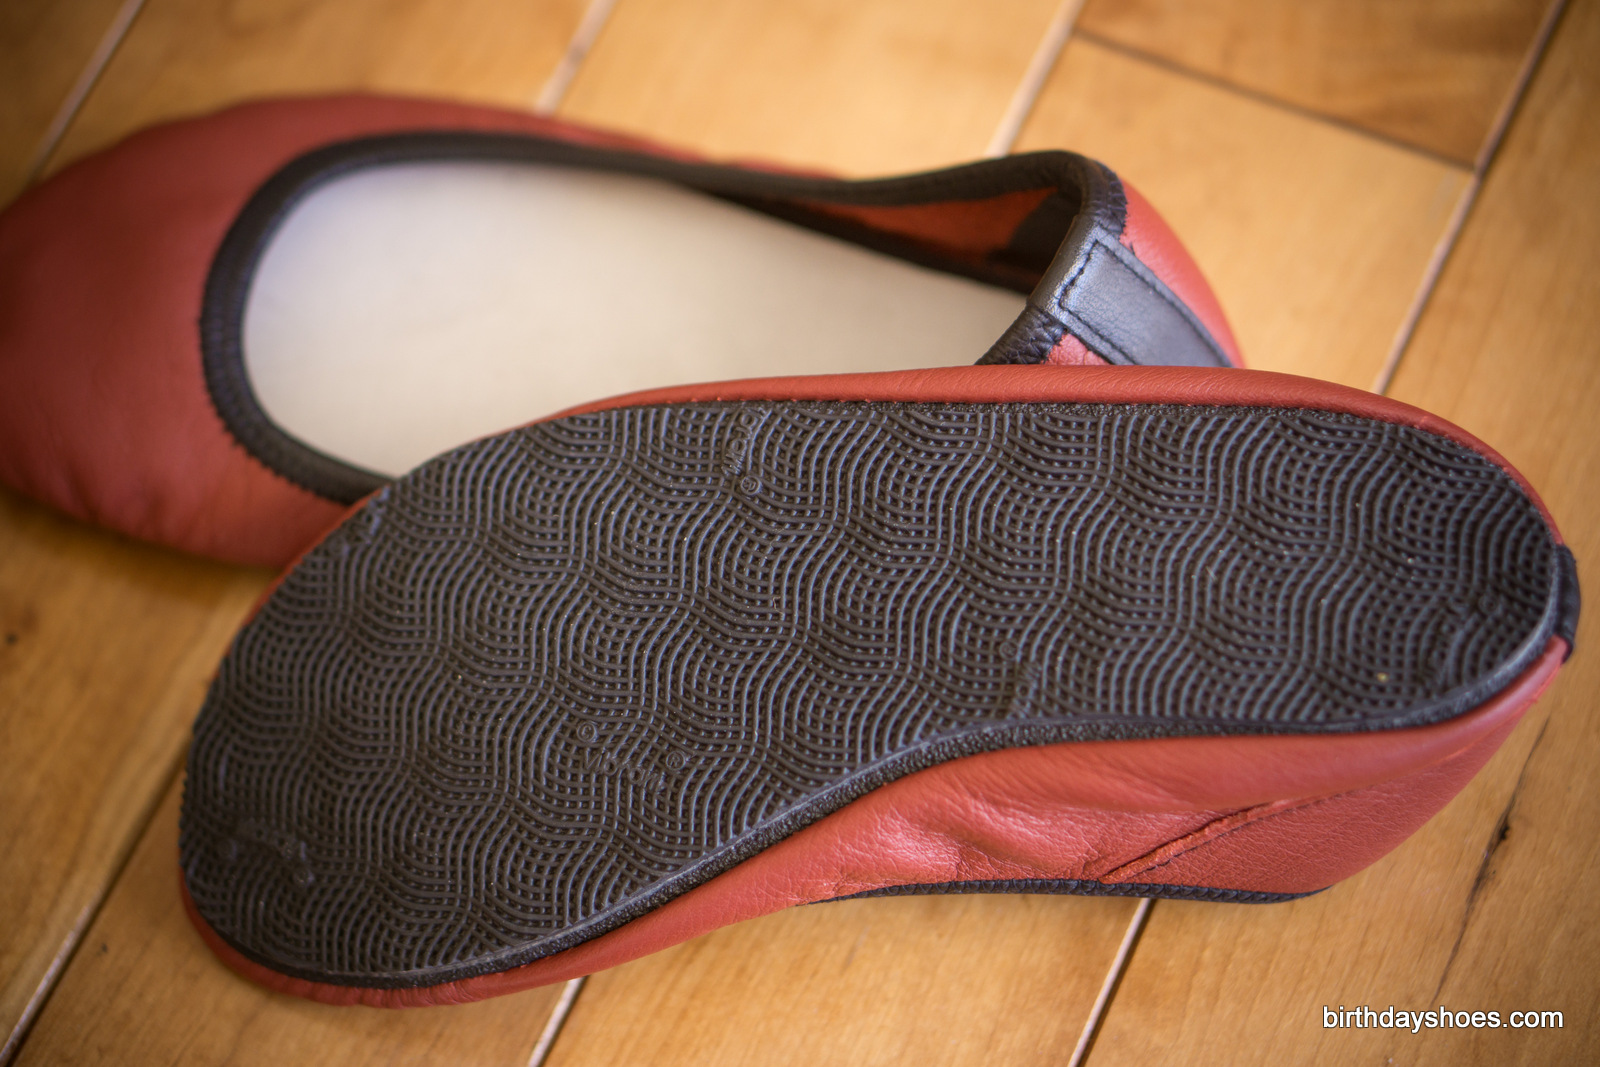 Vibram Cherry as seen on a pair of Soft Star Shoes Ballerine Flats